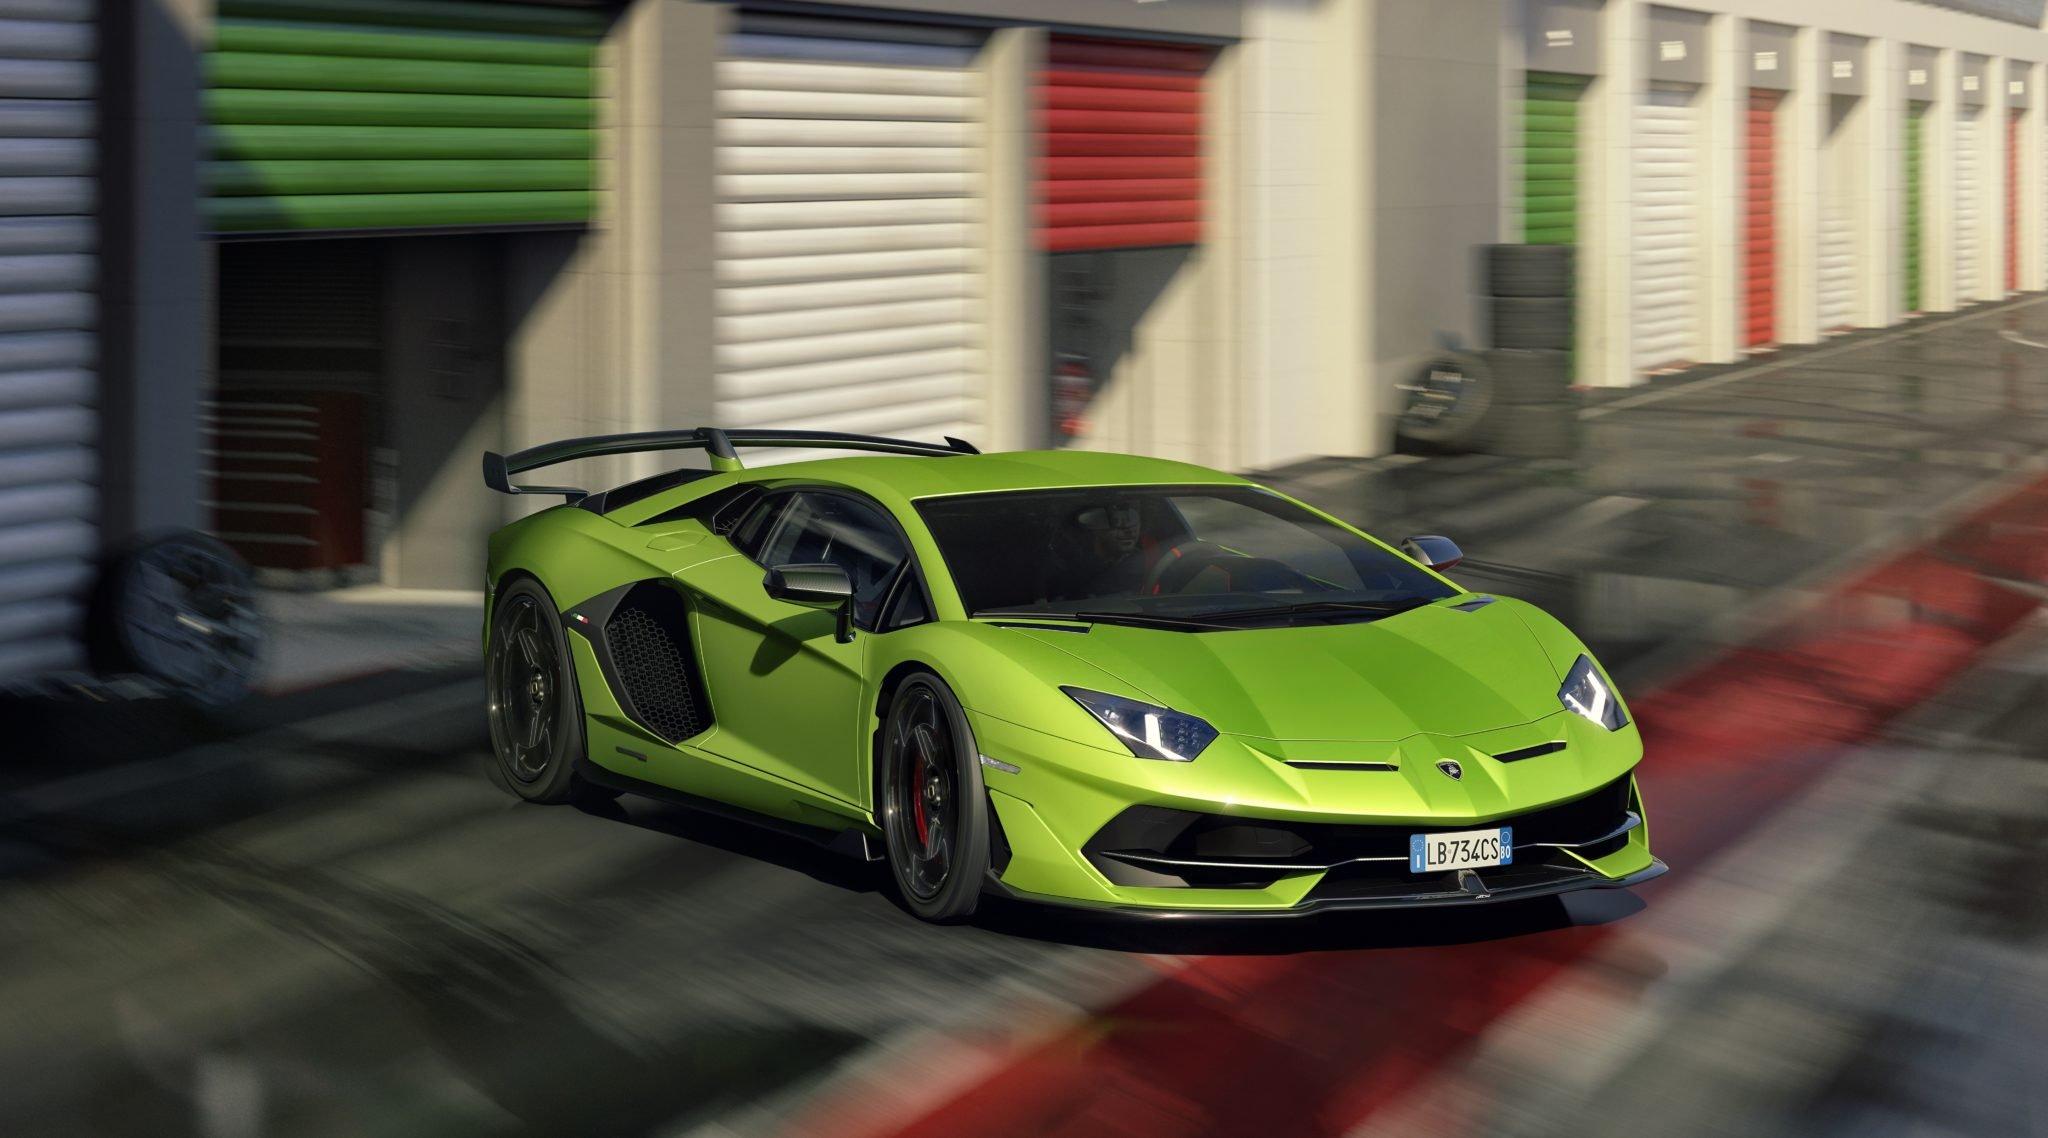 Raging Bull Unhinged Meet The Lamborghini Aventador Svj At Last